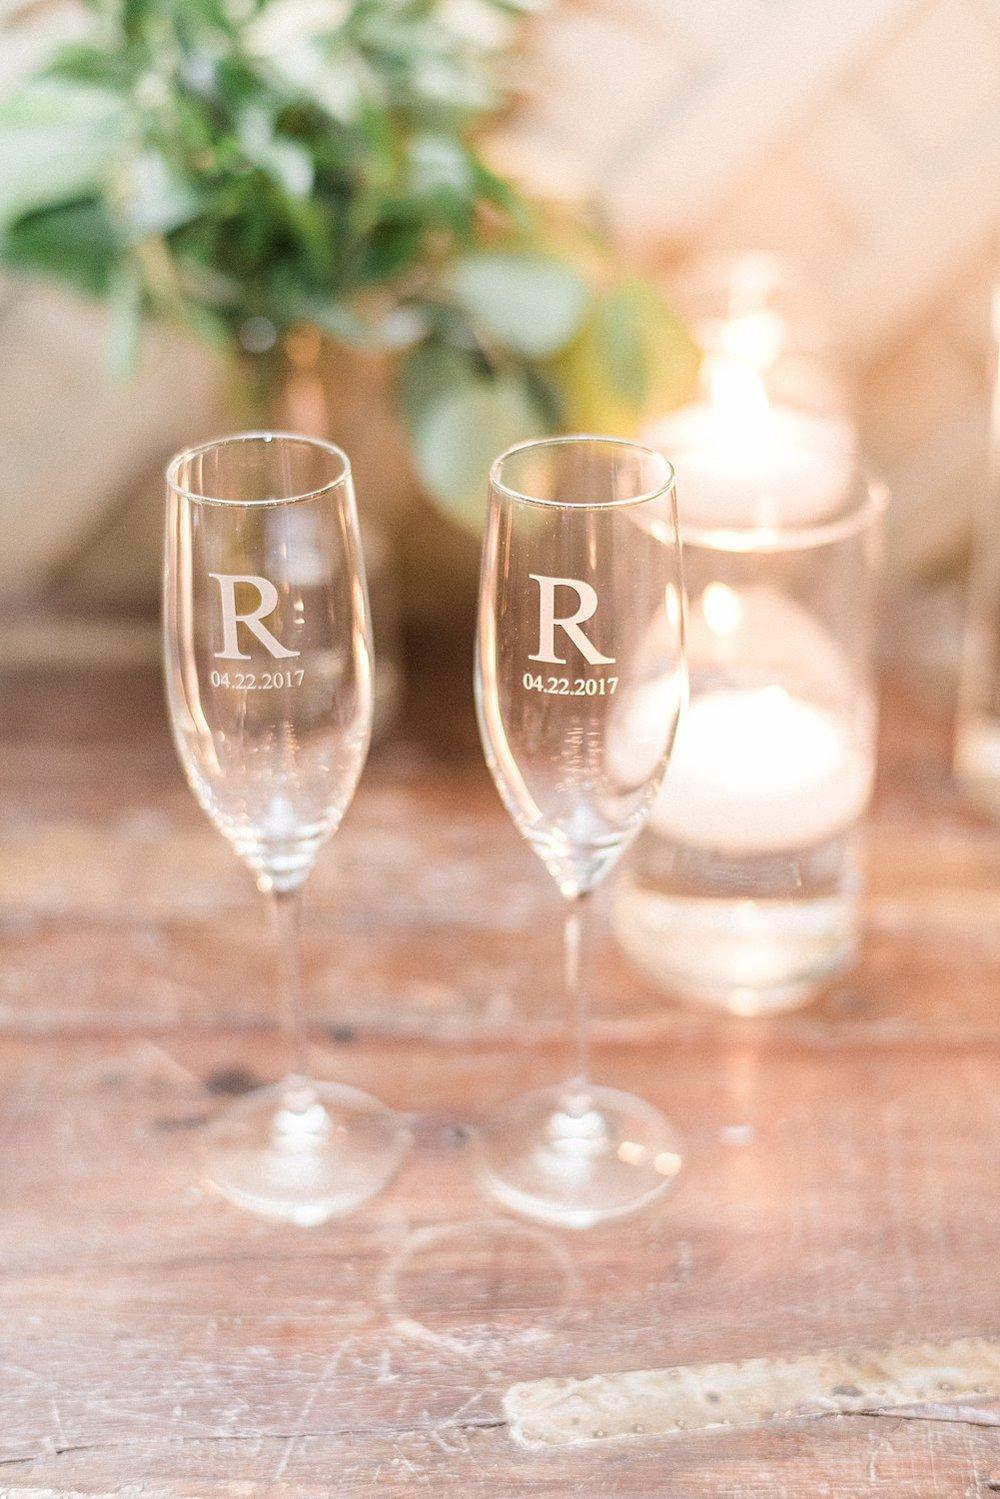 jessica & Andrew | walnut hill farm wedding | knoxville wedding photographer | juicebeats photography | wedding photography in knoxville